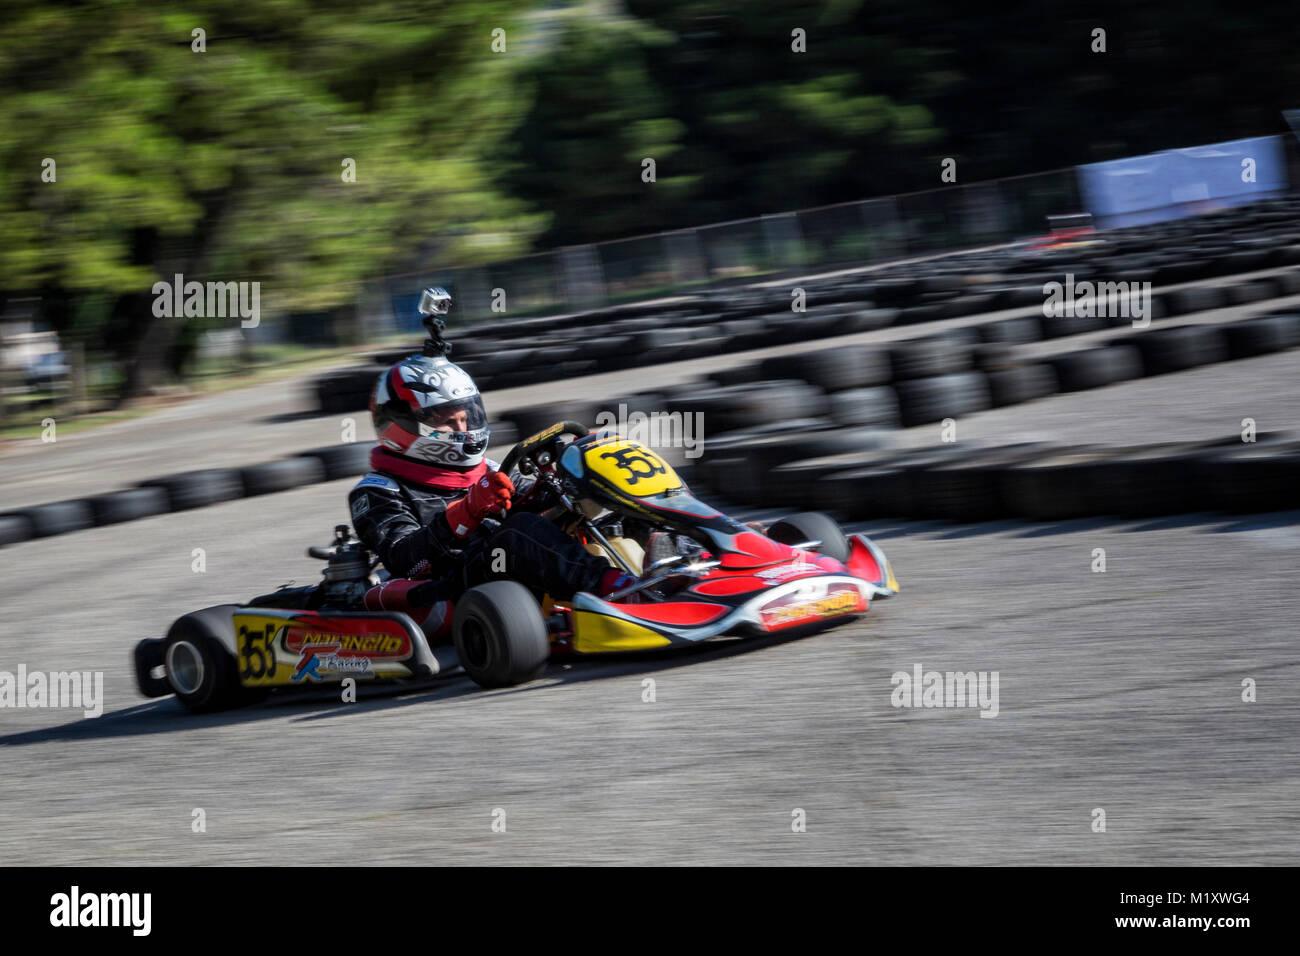 Driver in Go kart participate in outdoor kart race Stock Photo